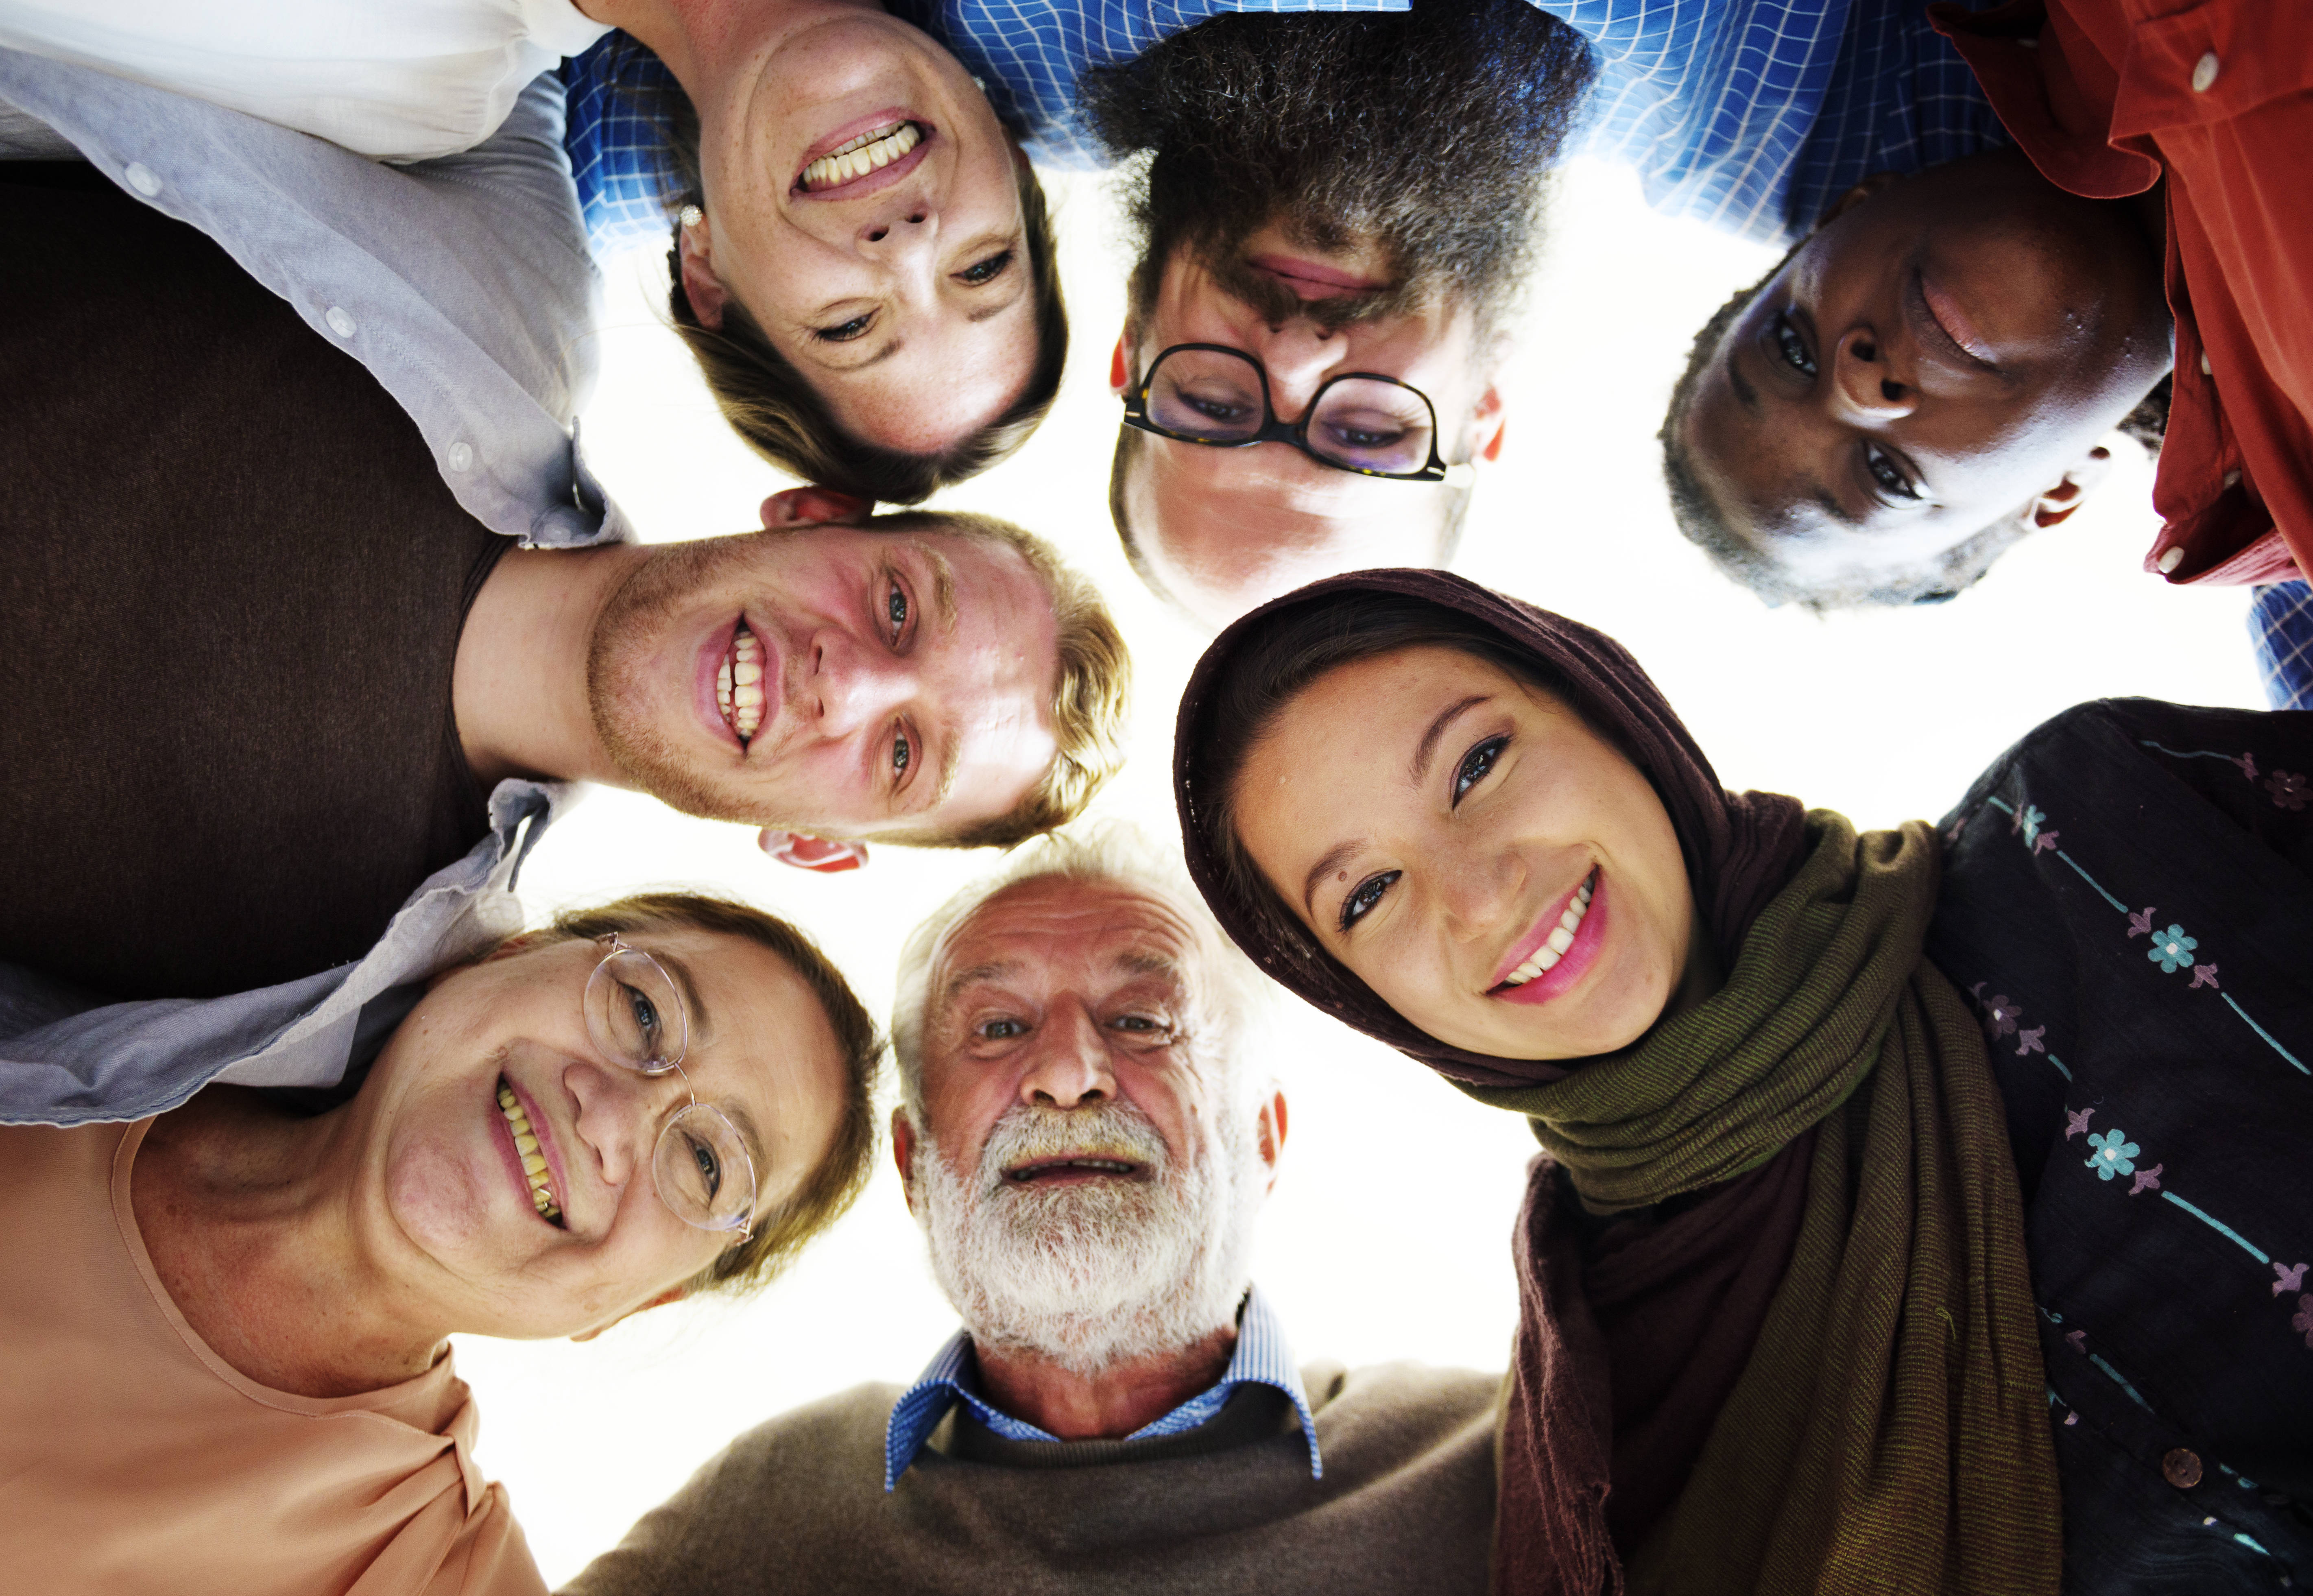 Bayonne Residents Encouraged to Attend U.S. Census Bureau Job Fair Tuesday